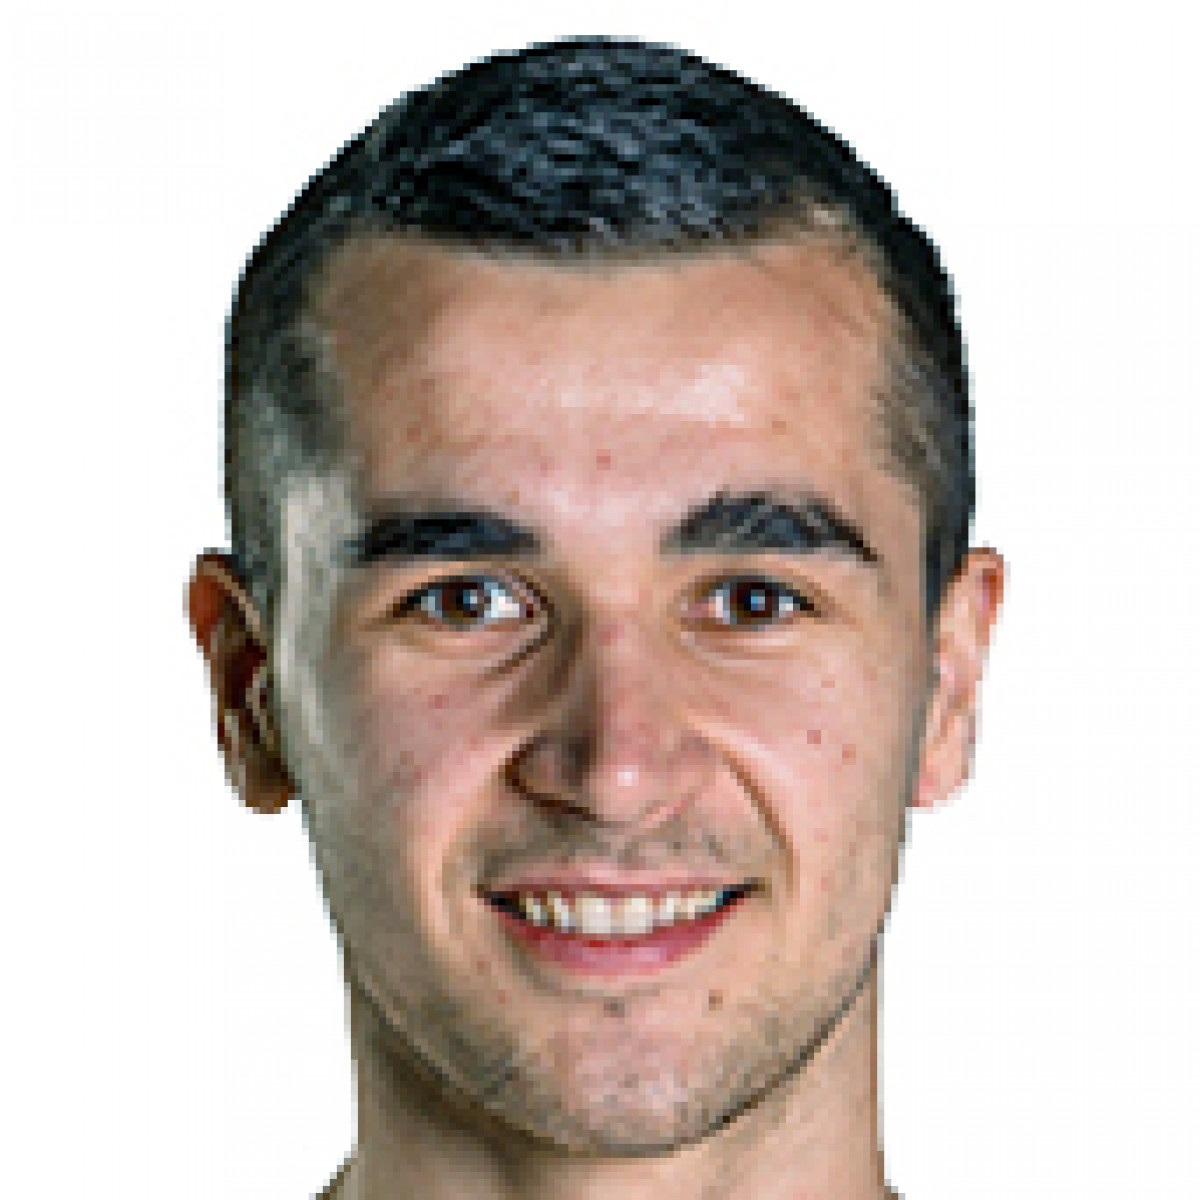 Stefan Mijovic